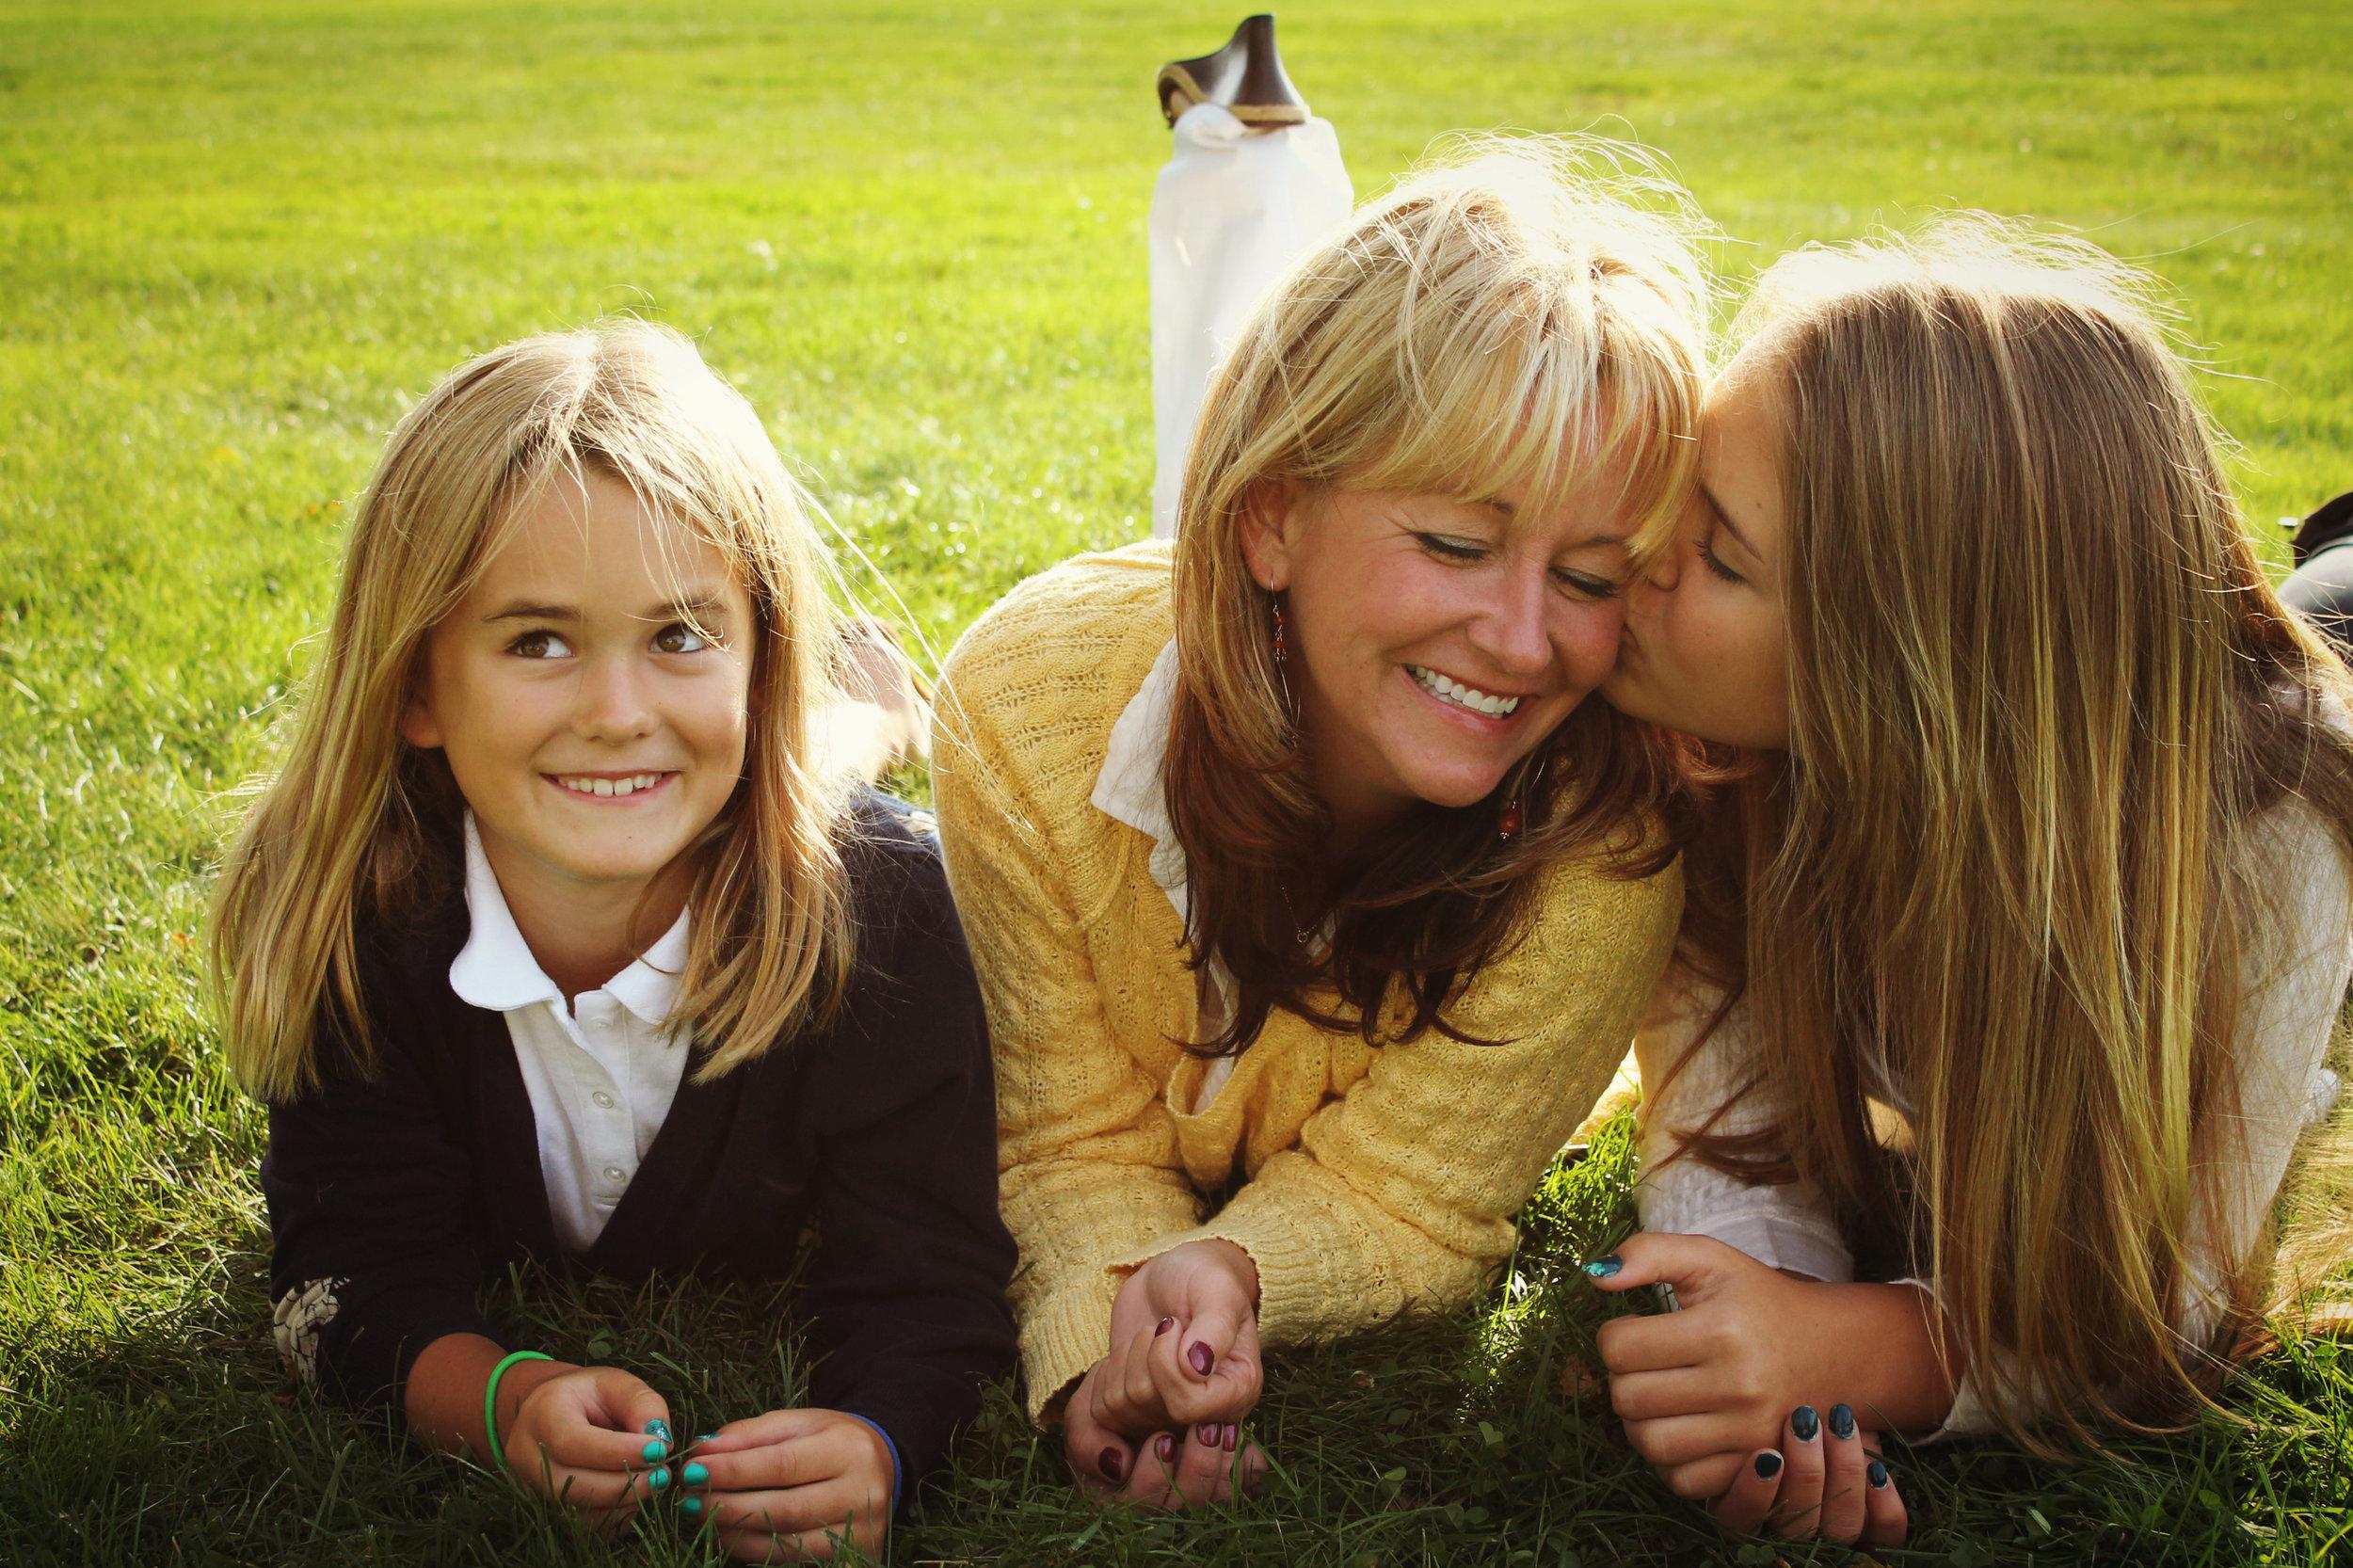 Forster Orthodontics patients' family portrait by Meri Keller Photography